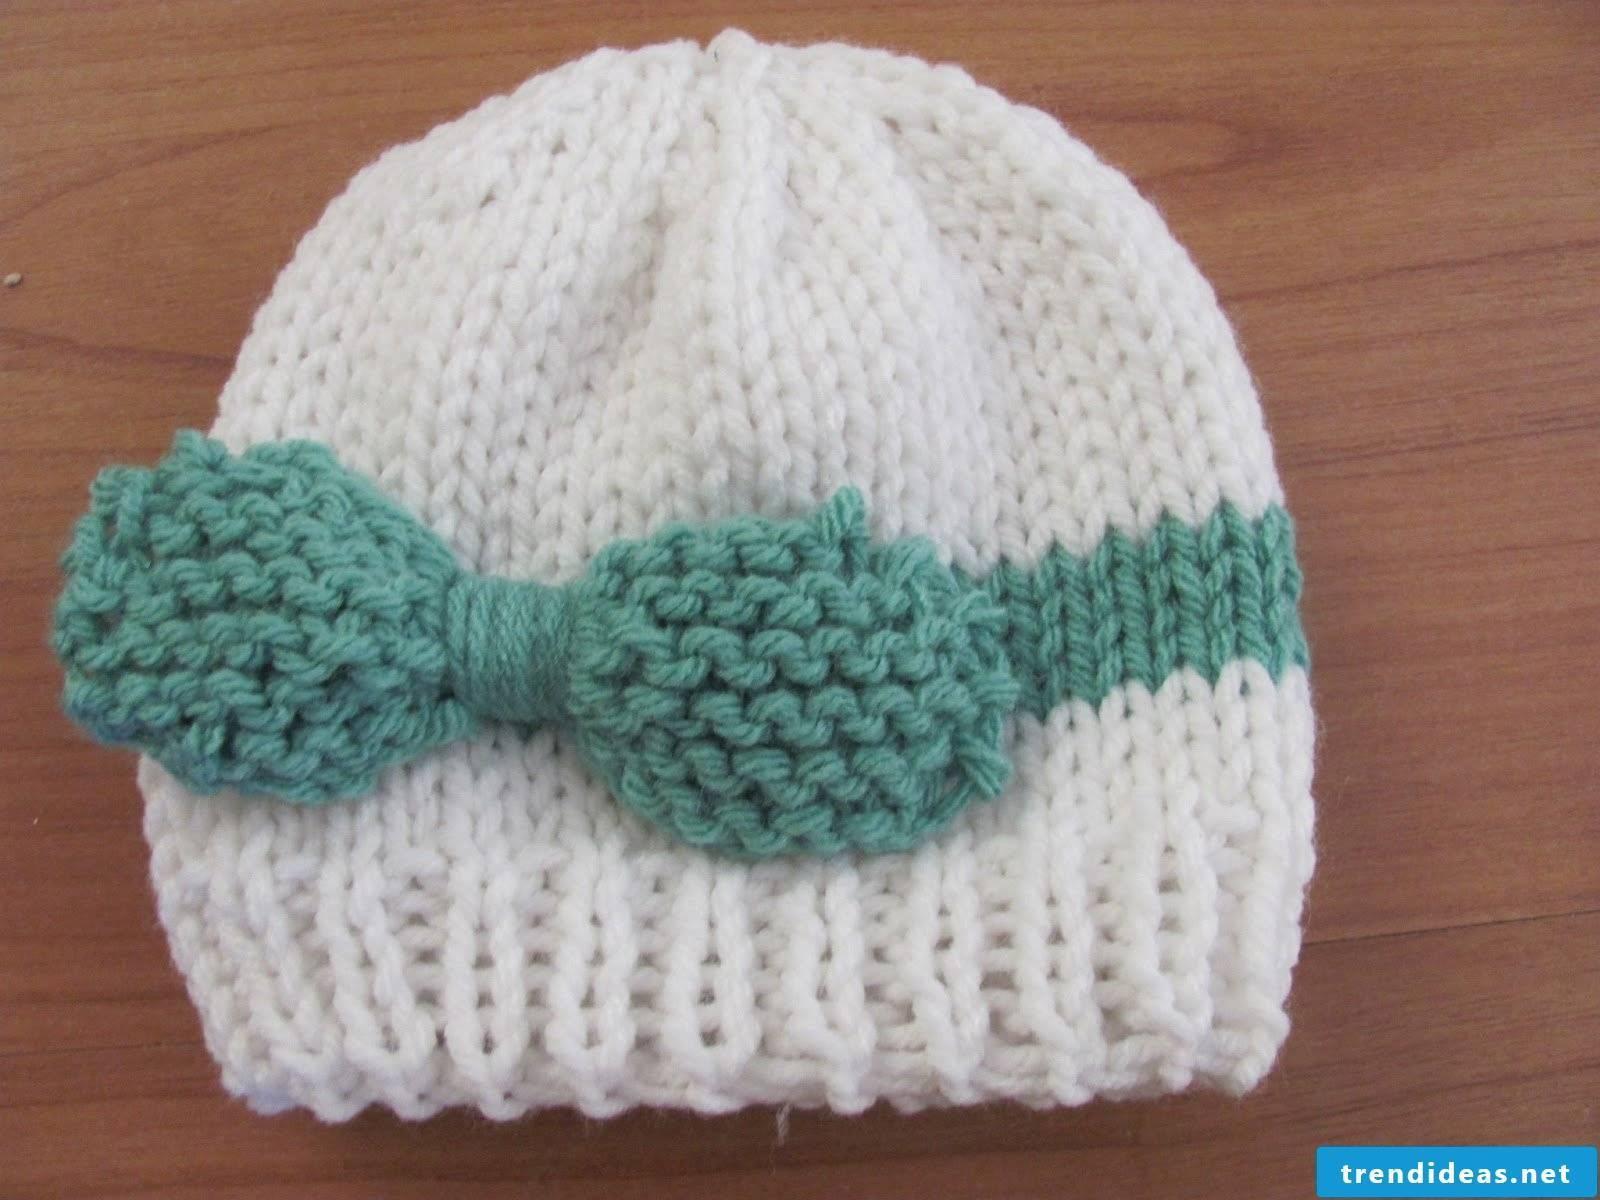 Knitting cap - instructions